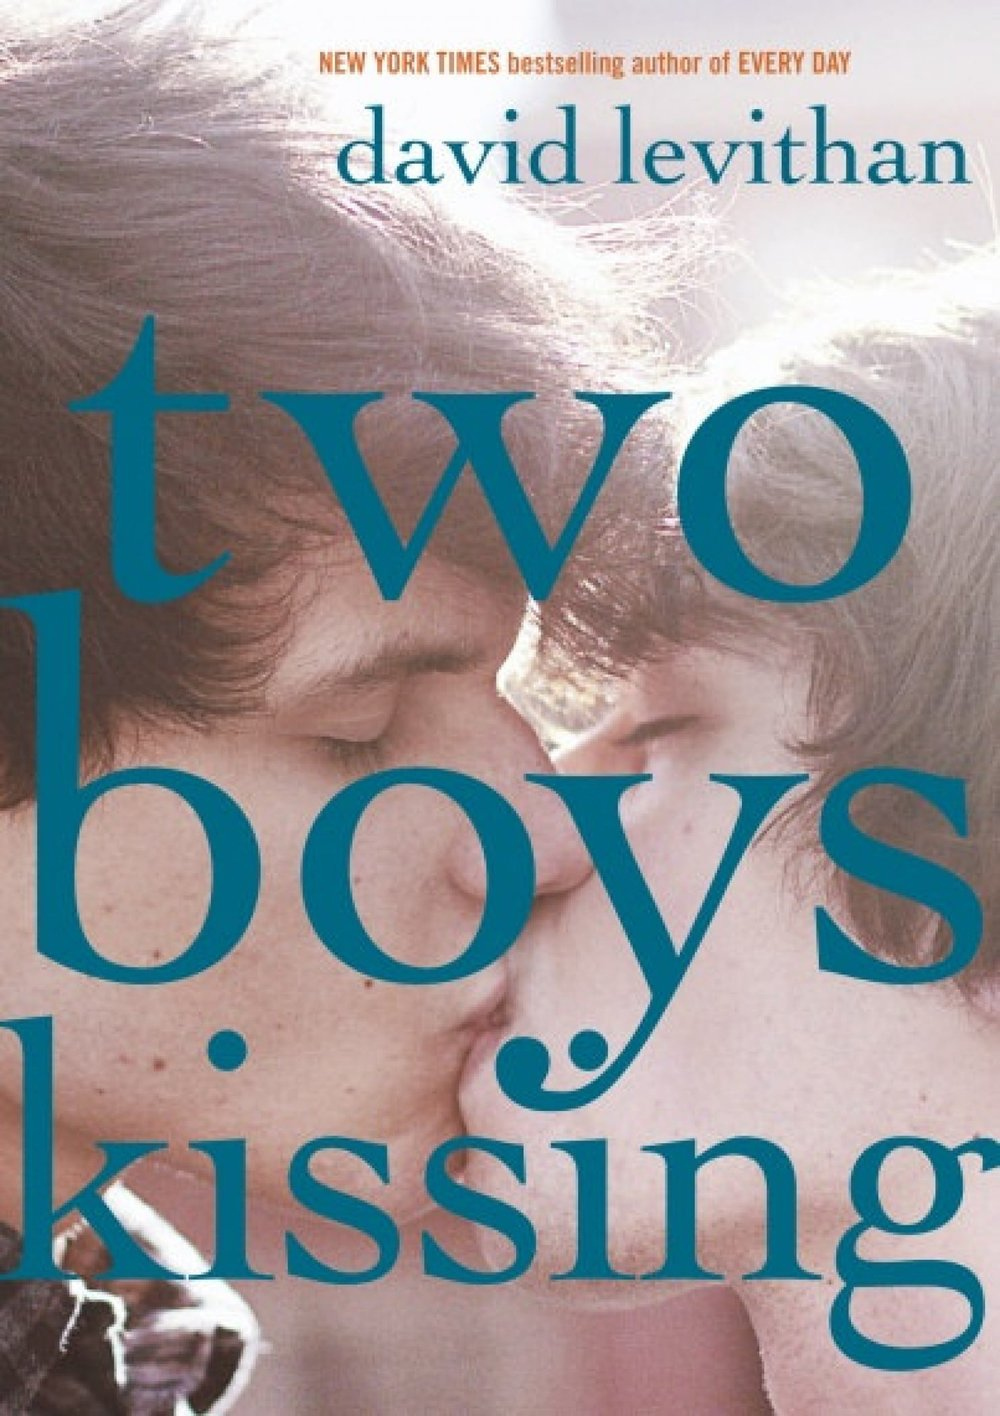 david-levithan-two-boys-kissing.jpg